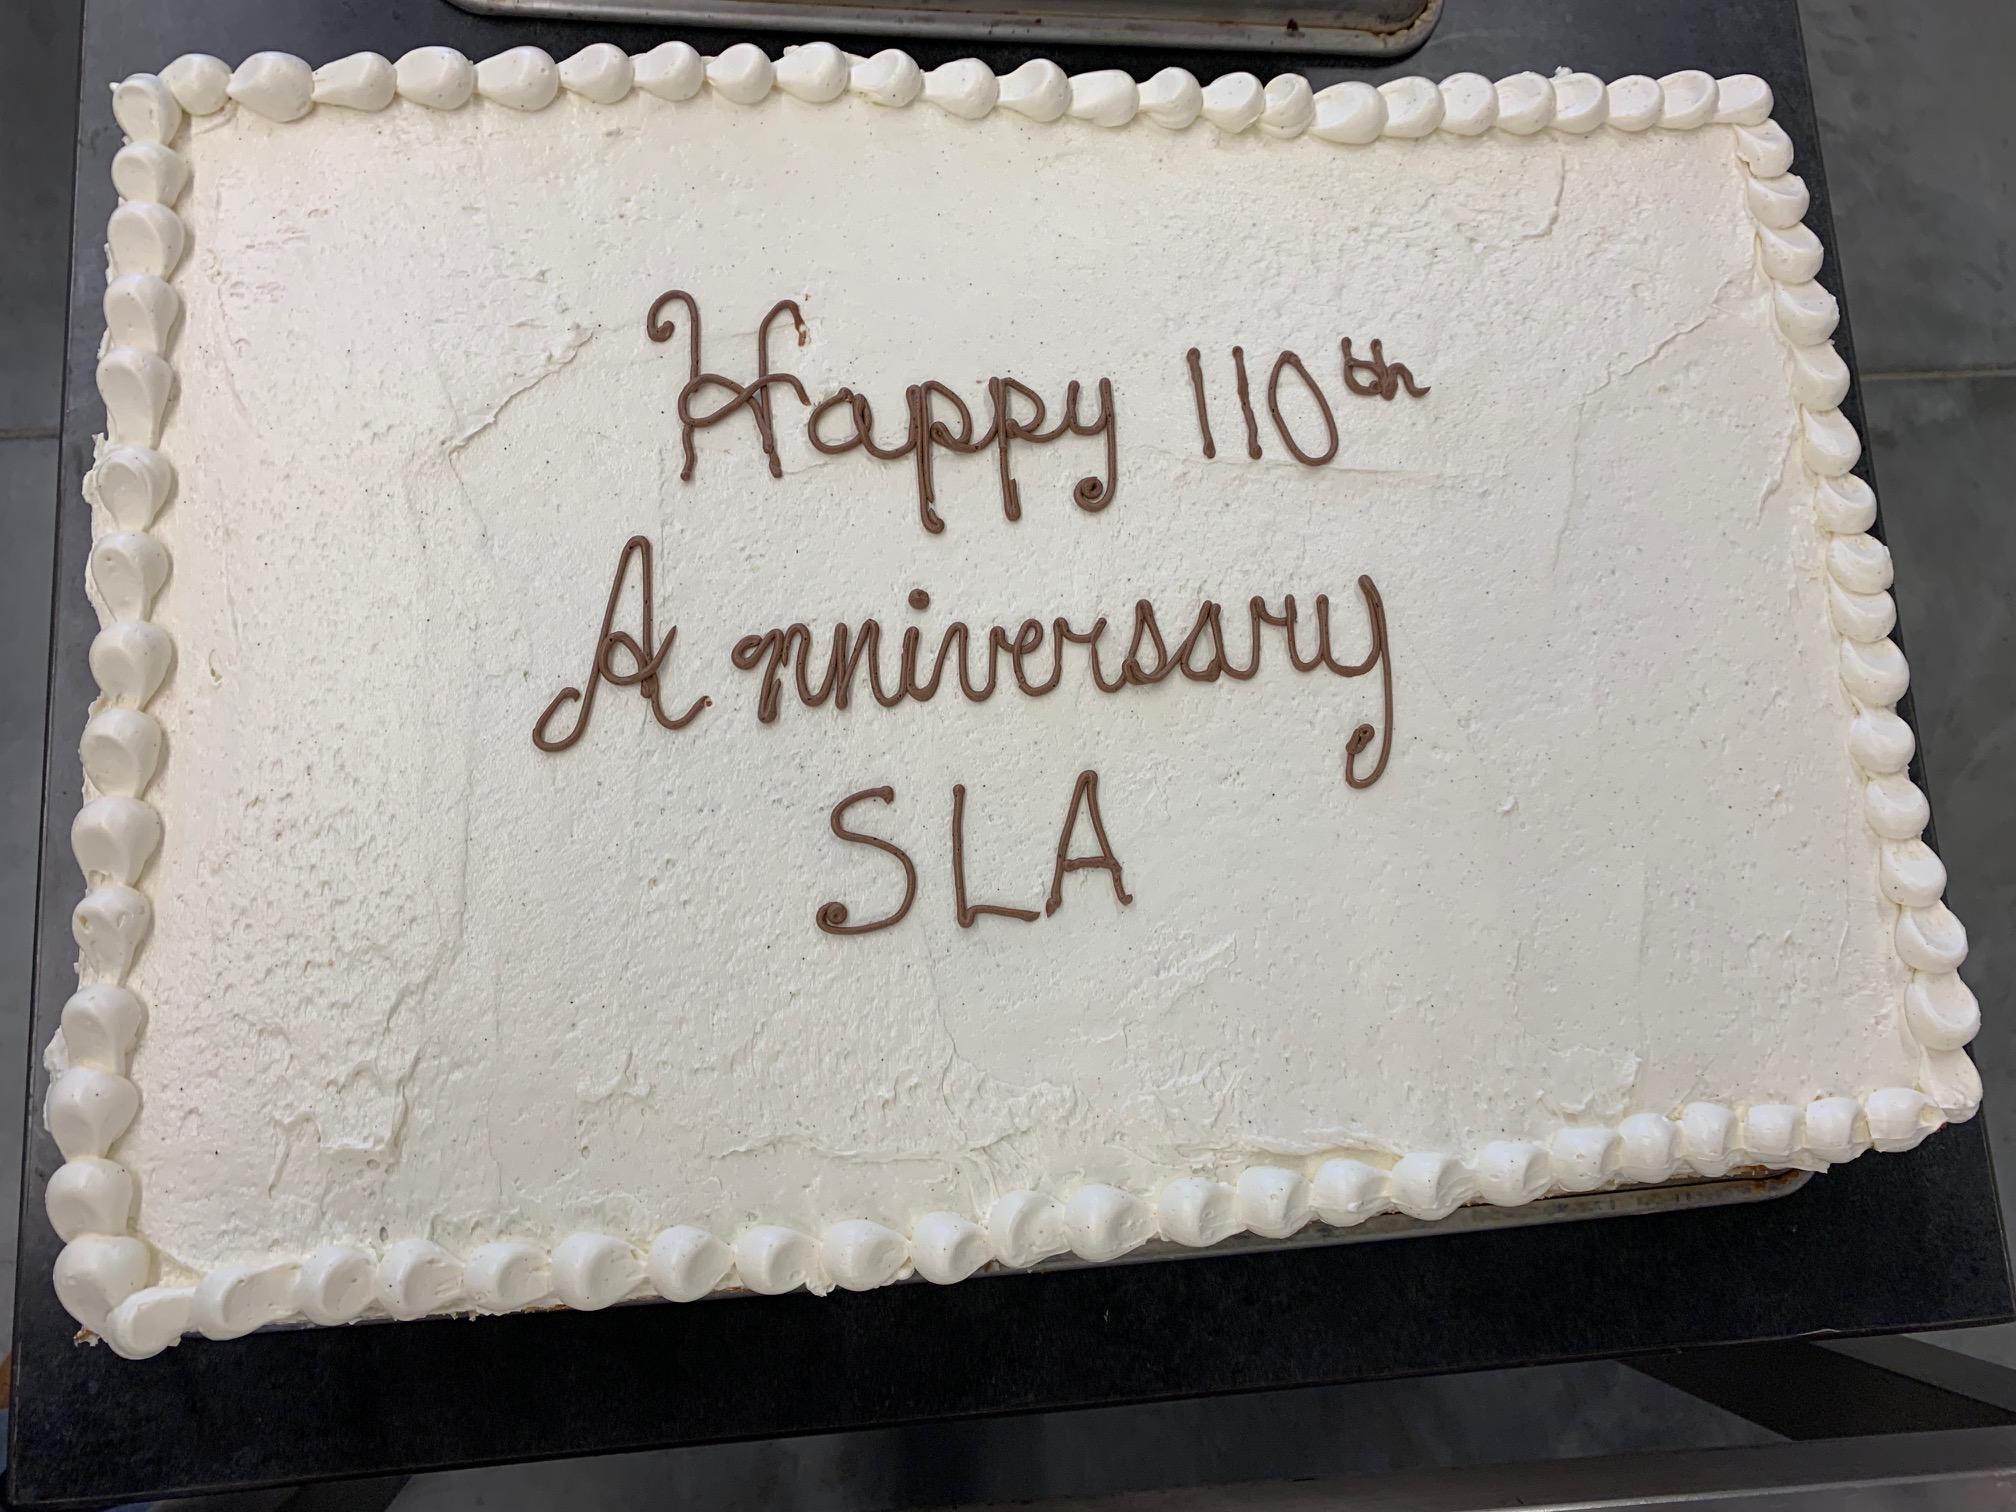 Happy 110th Anniversary SLA!